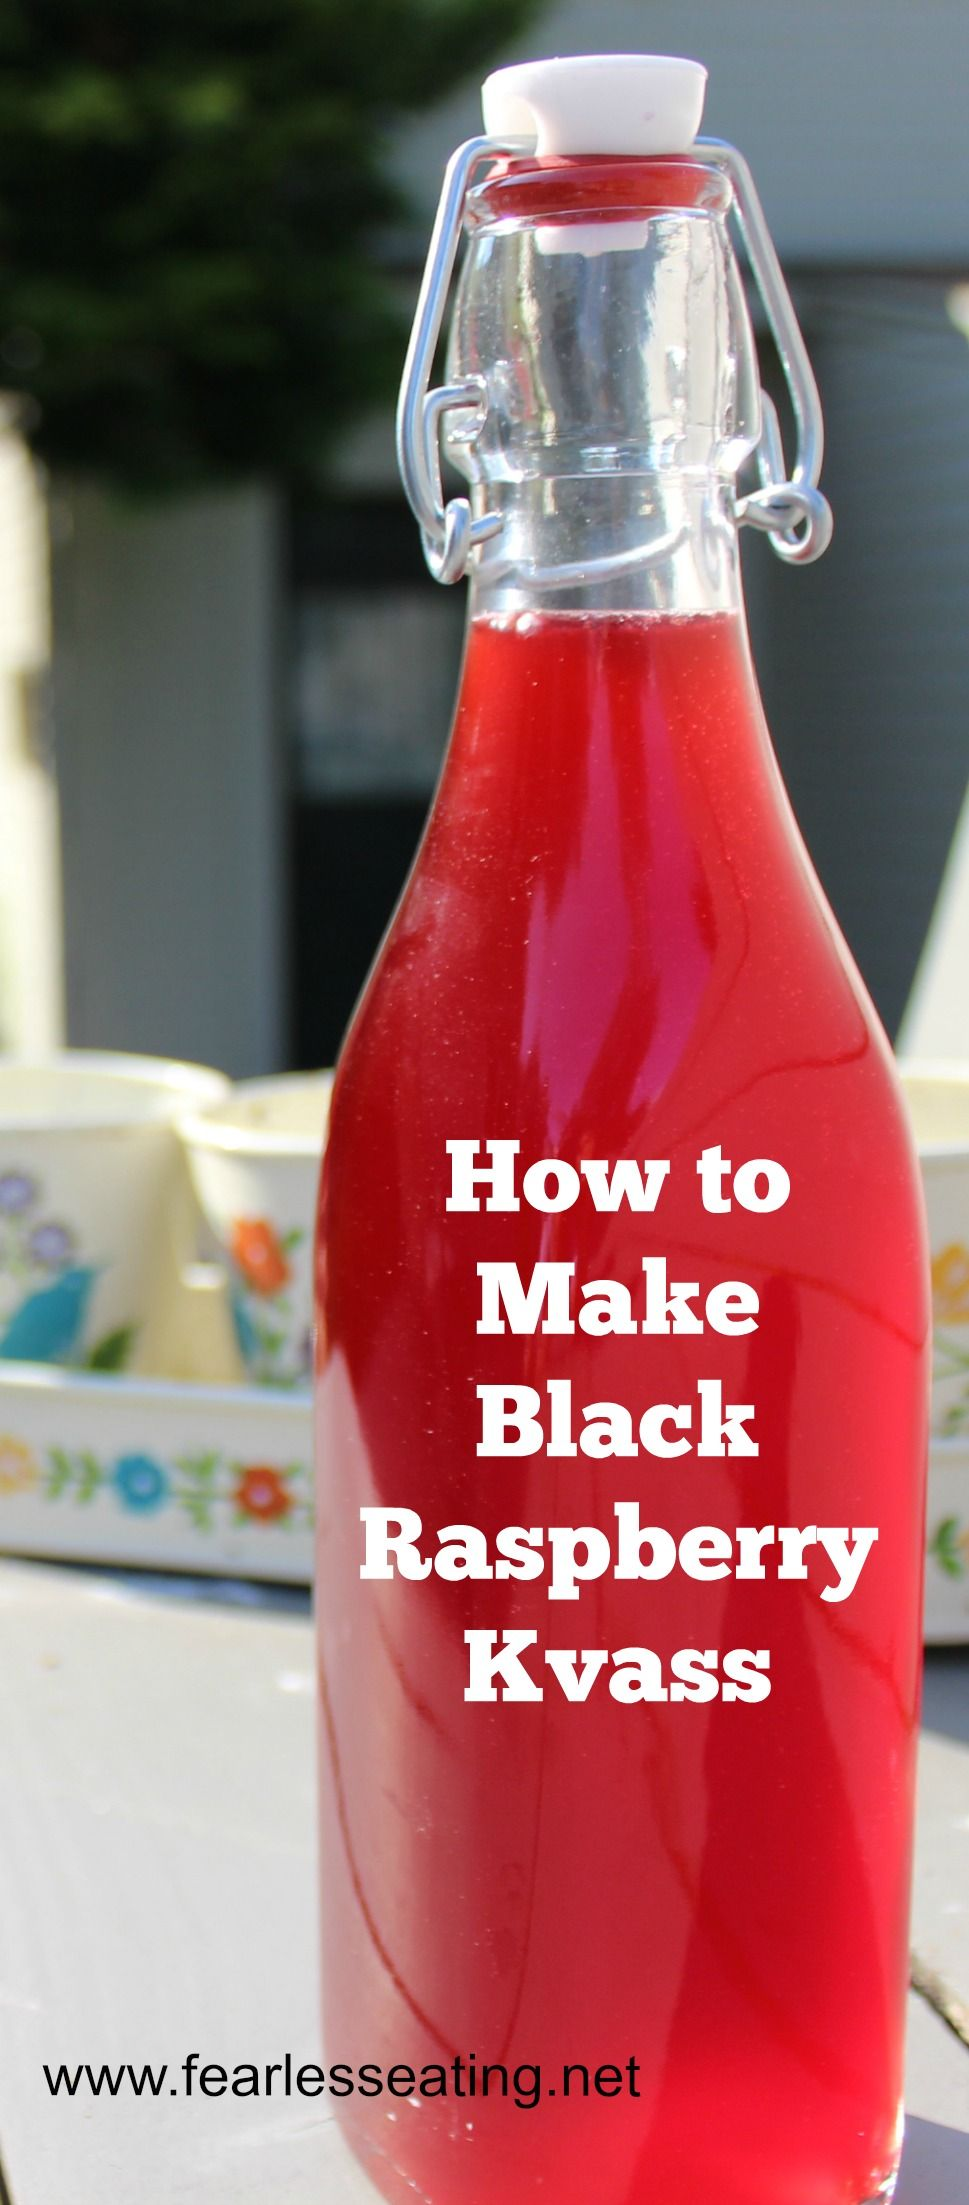 How to Make Black Raspberry Kvass | Fearless Eating